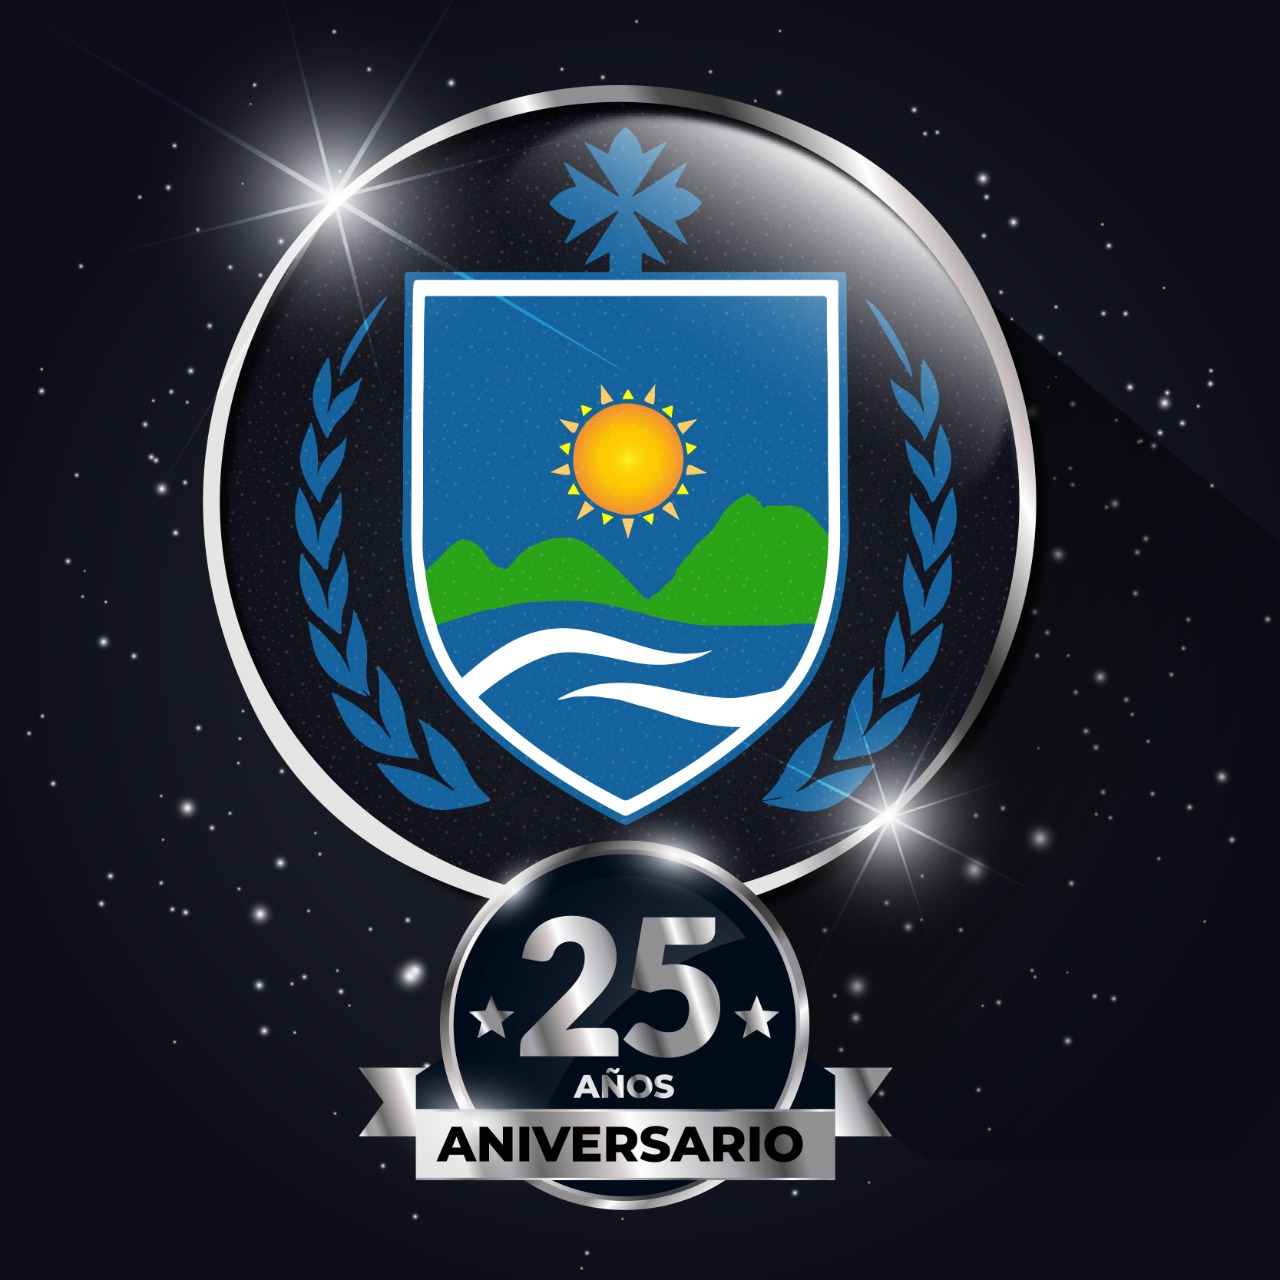 25 AÑOS VICARIATO APOSTOLICO INIRIDA